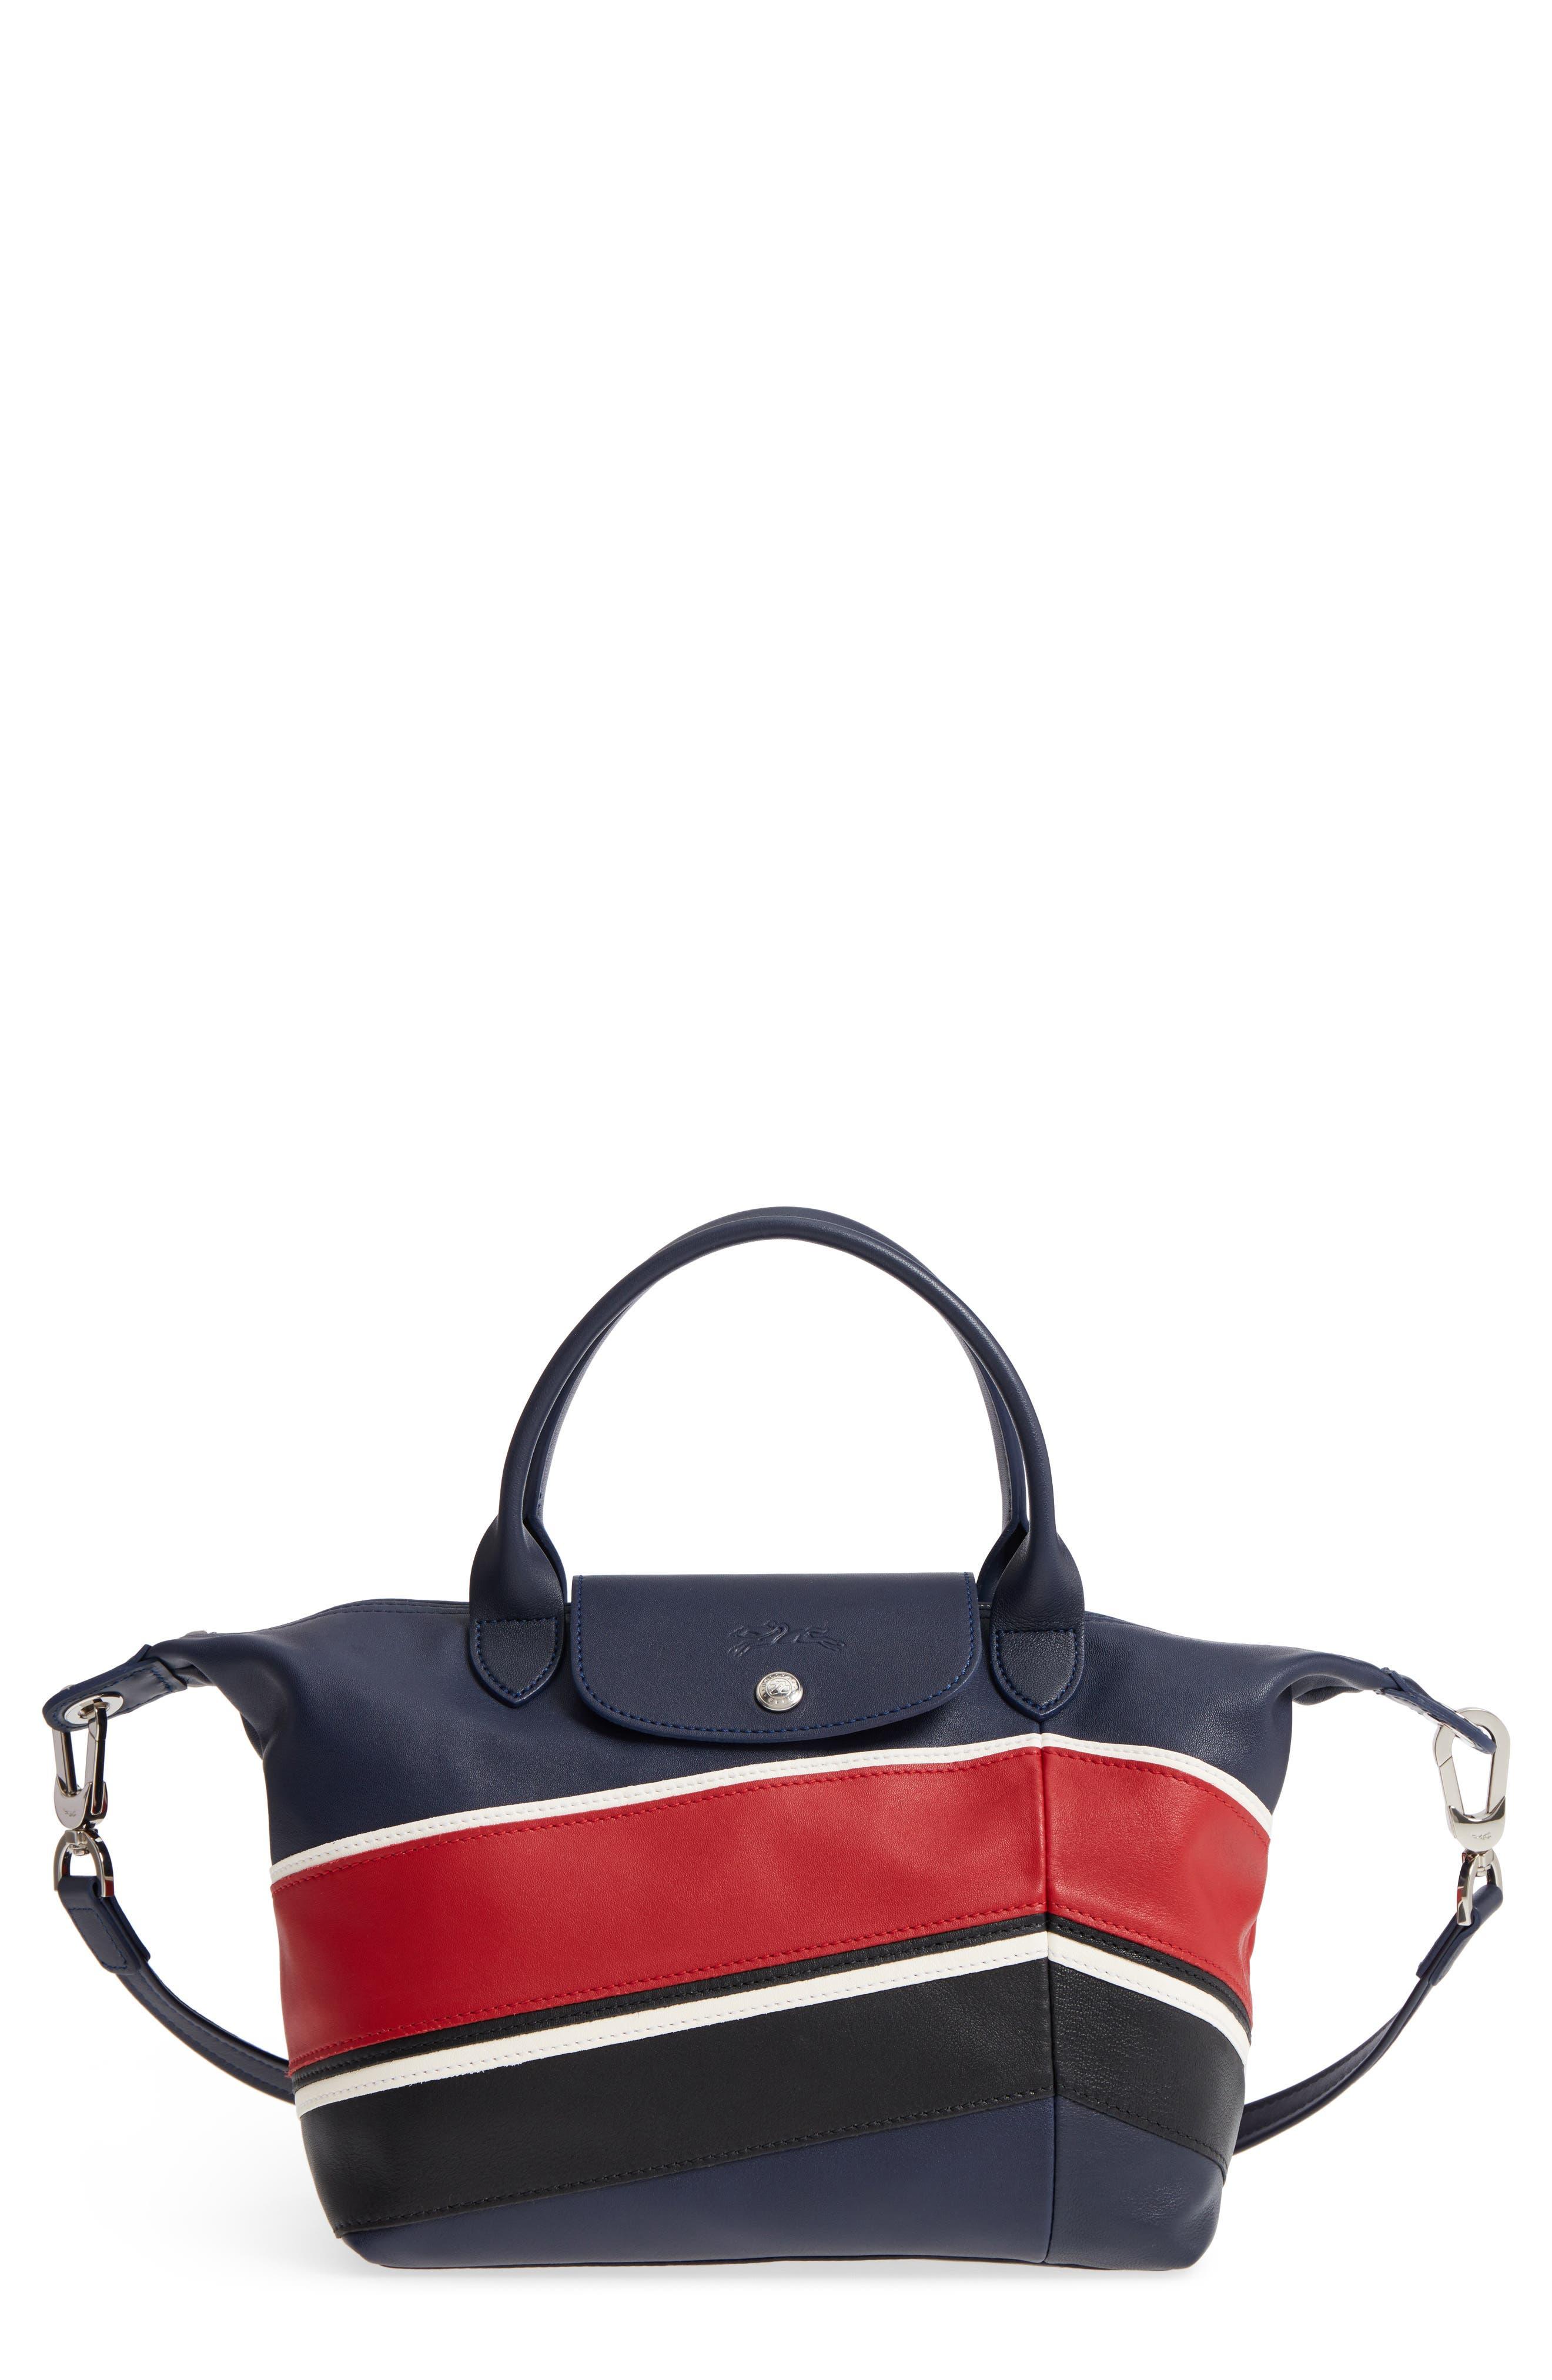 Small Le Pliage Cuir - Chevron Top Handle Leather Tote,                         Main,                         color, 622